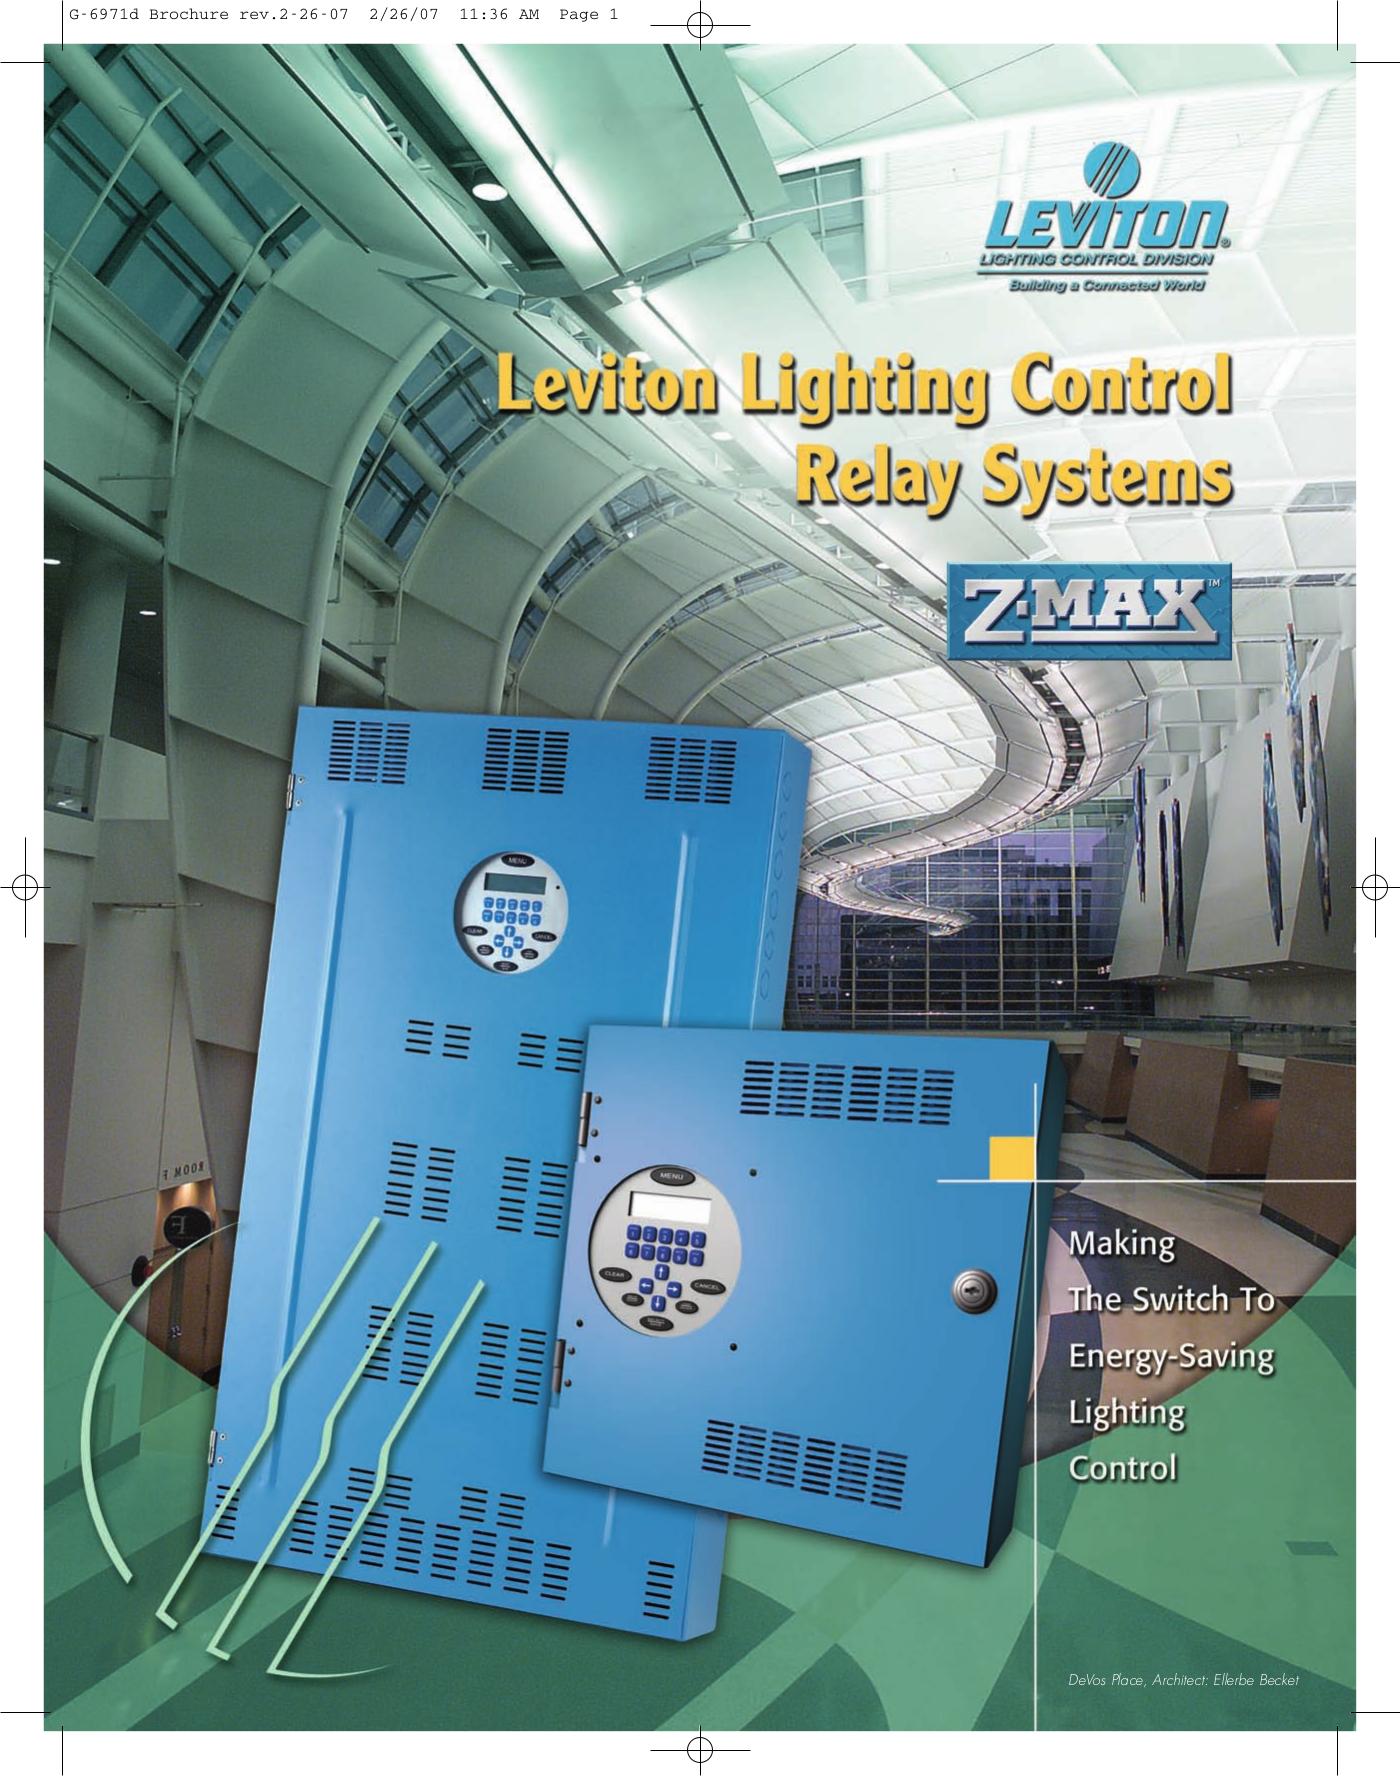 pdf for Leviton Other miniZ mZd30-101 Harvesting Controller manual